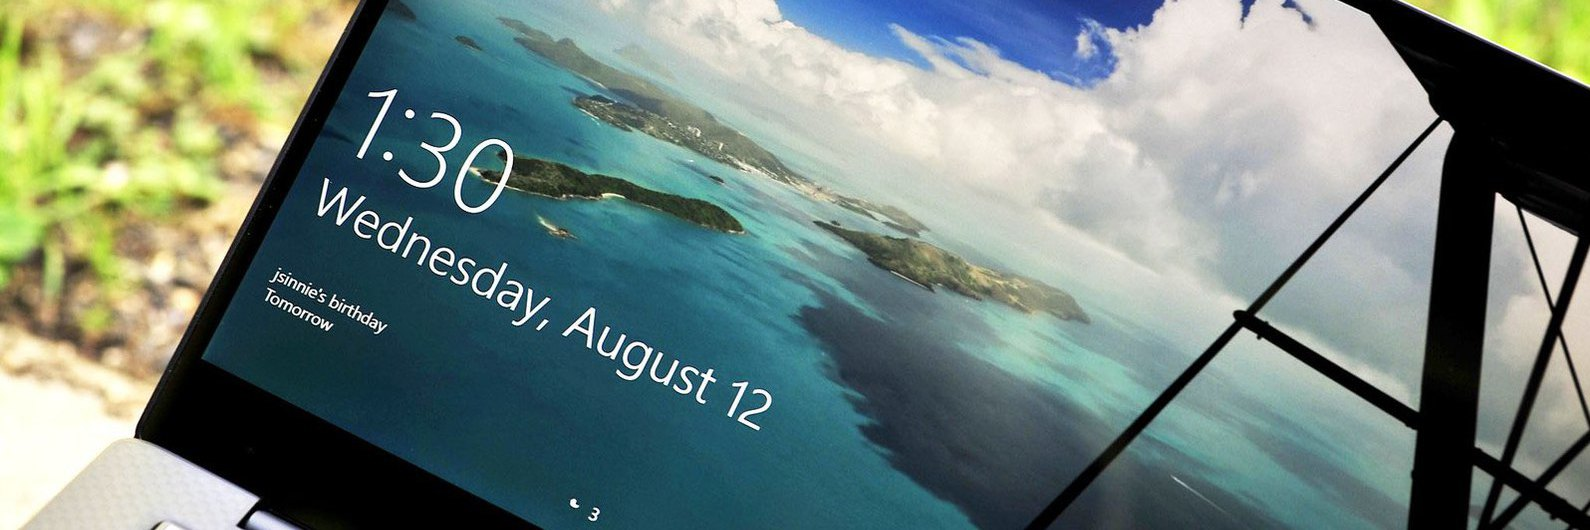 Fall Creators Update vai trazer uma limpeza grande ao Windows 10